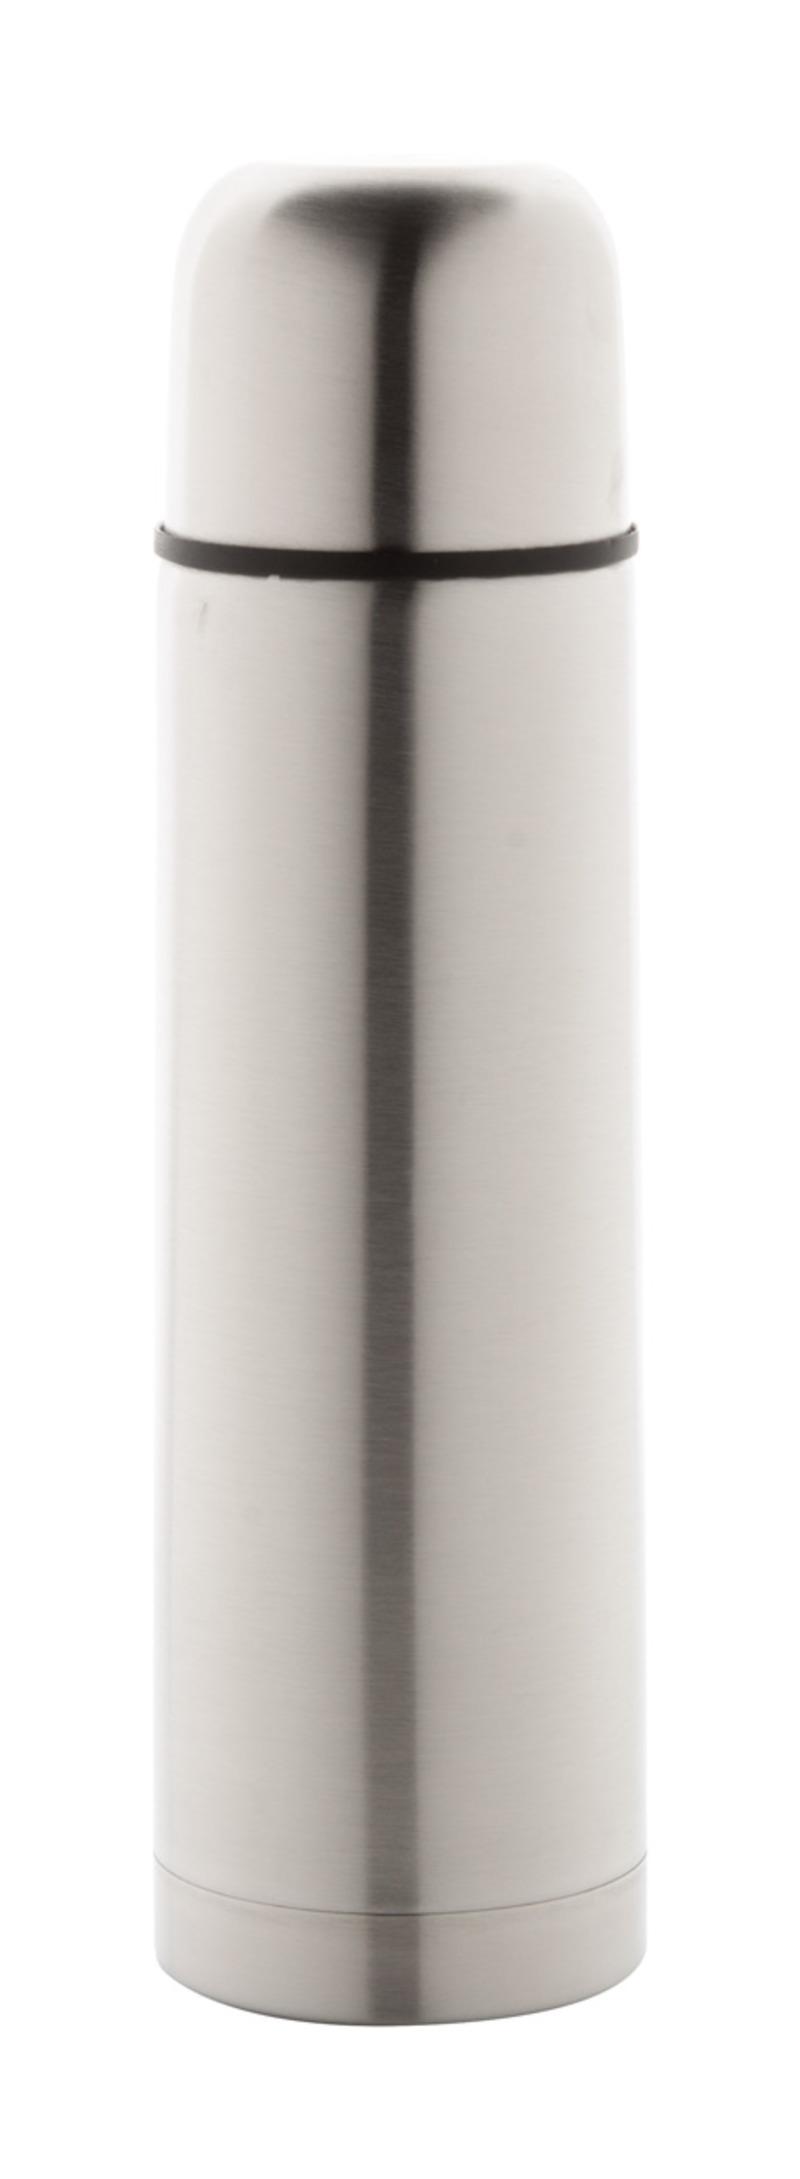 Robusta vacuum flask